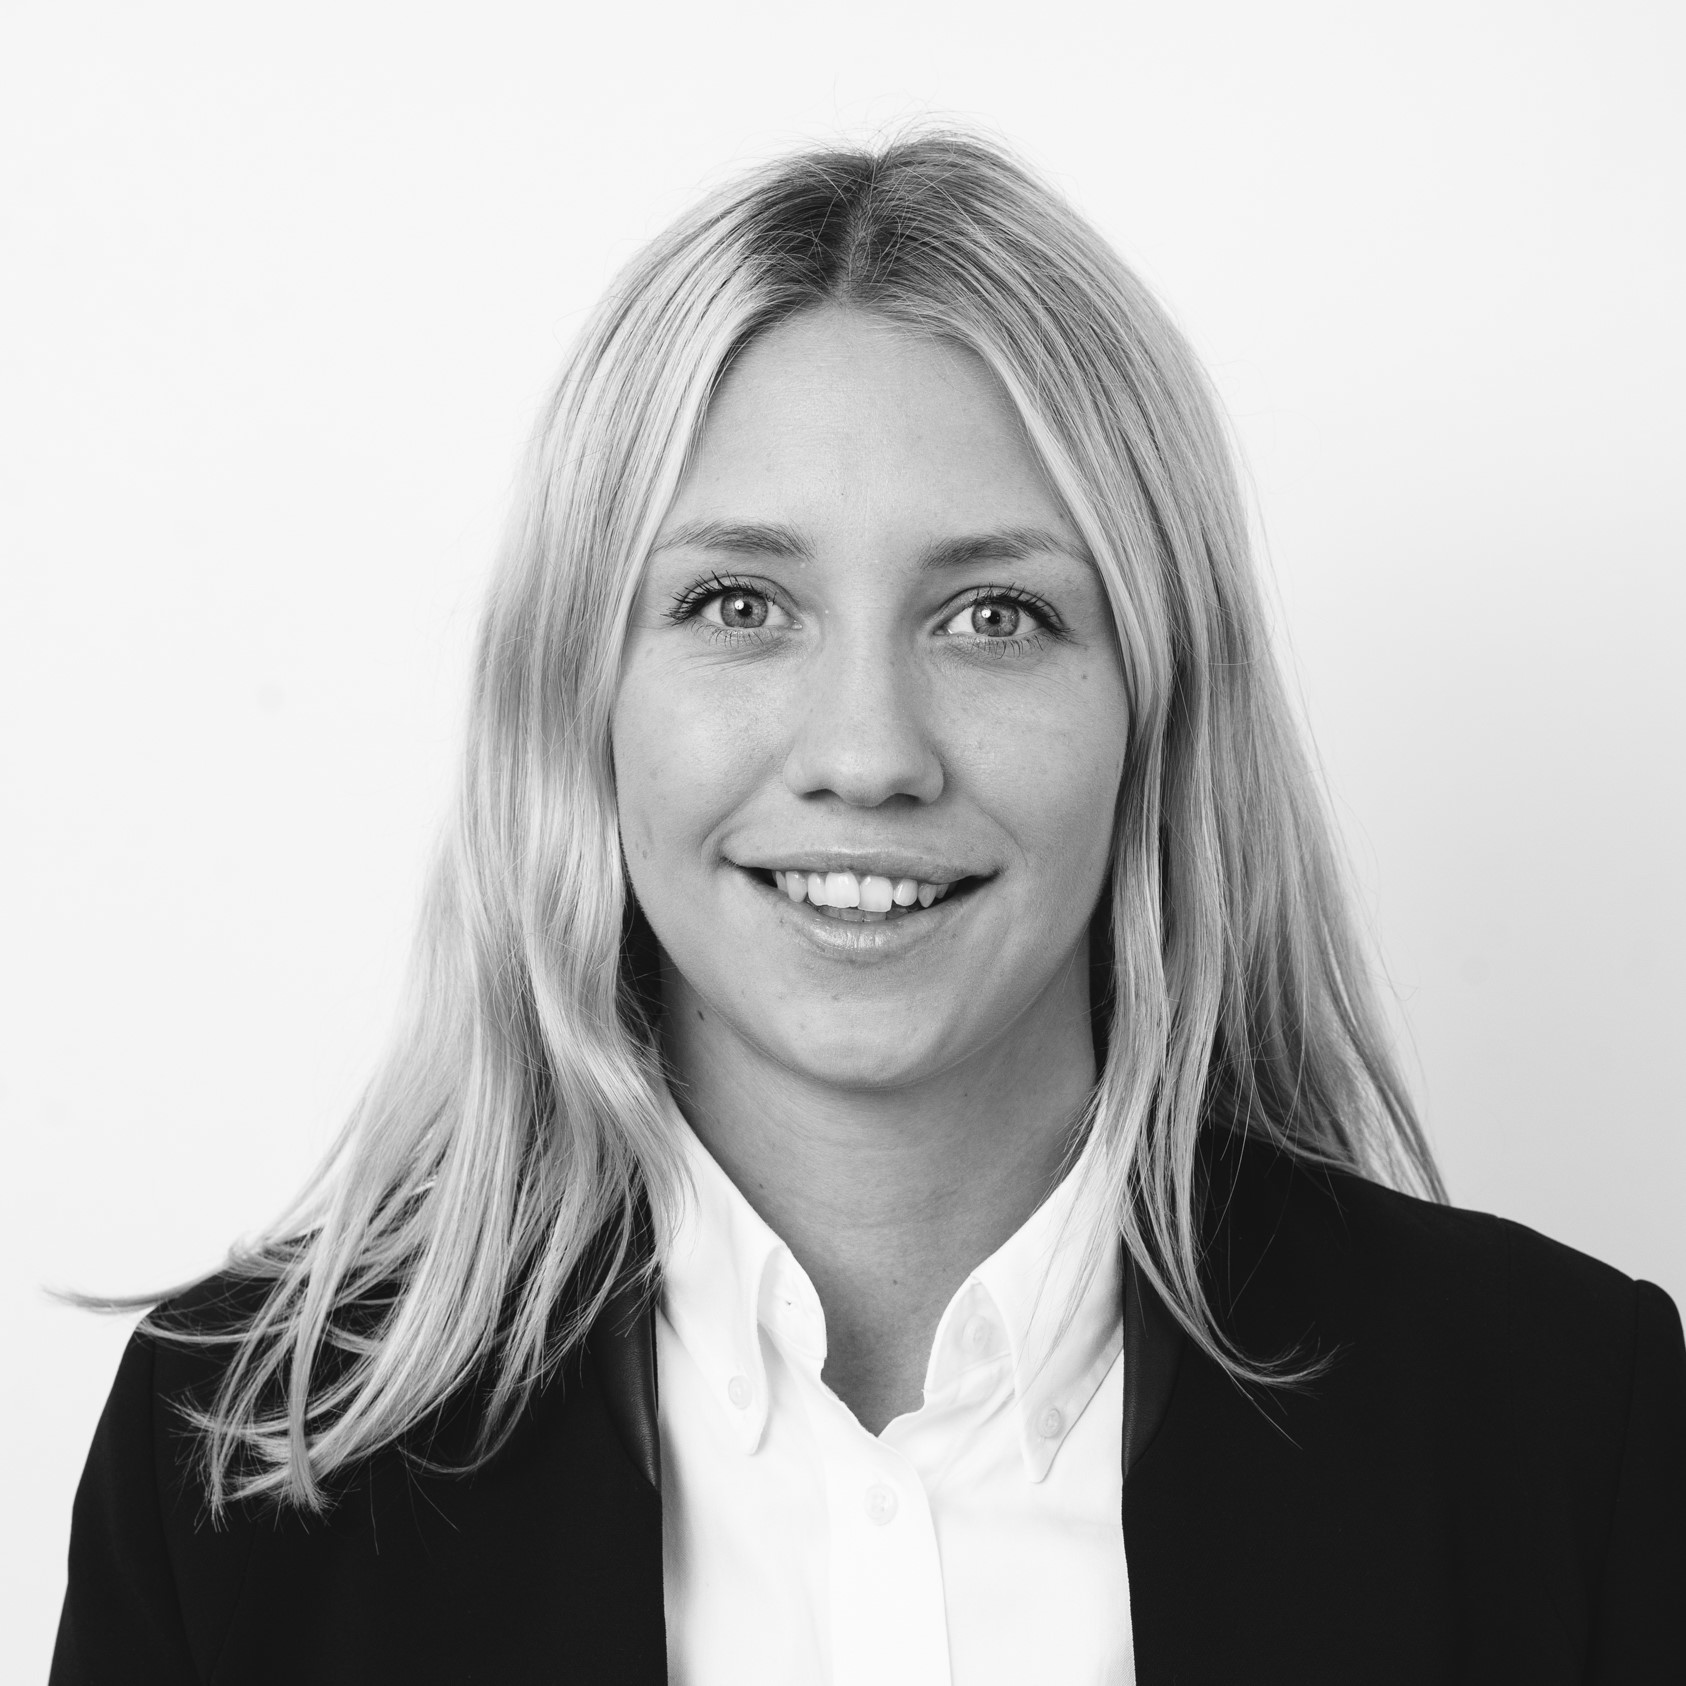 Sophie Sundberg